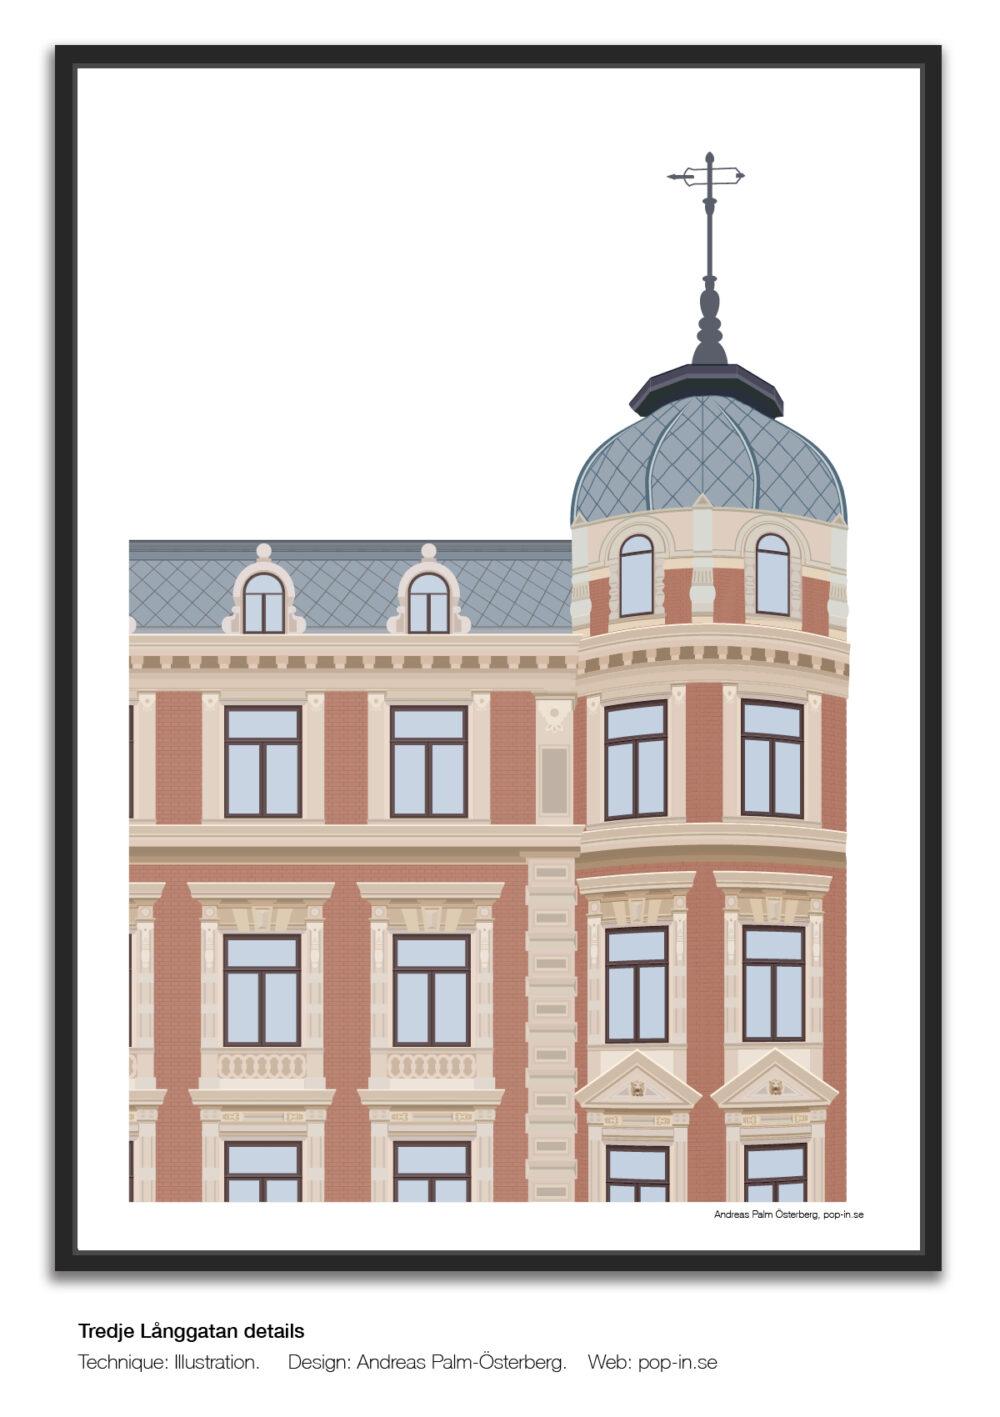 Tredje Långgatan details